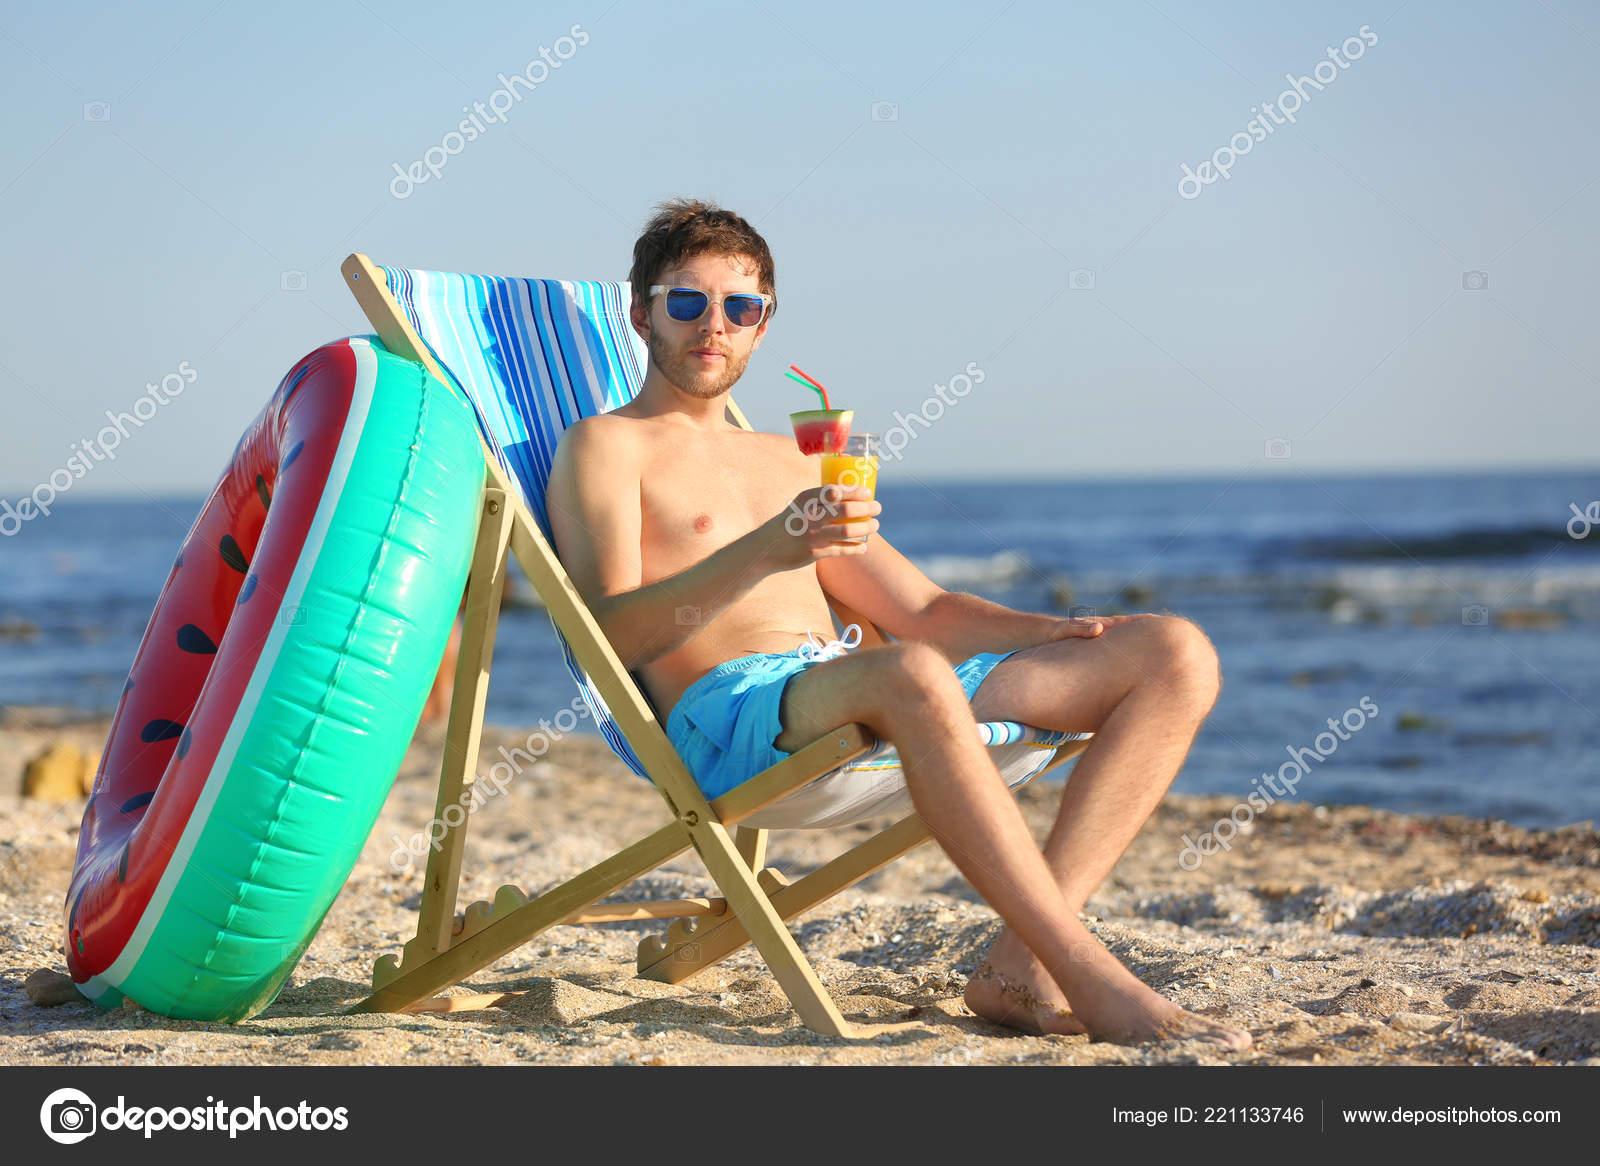 Young Man Cocktail Beach Chair Seacoast Stock Photo Image By C Liudmilachernetska Gmail Com 221133746